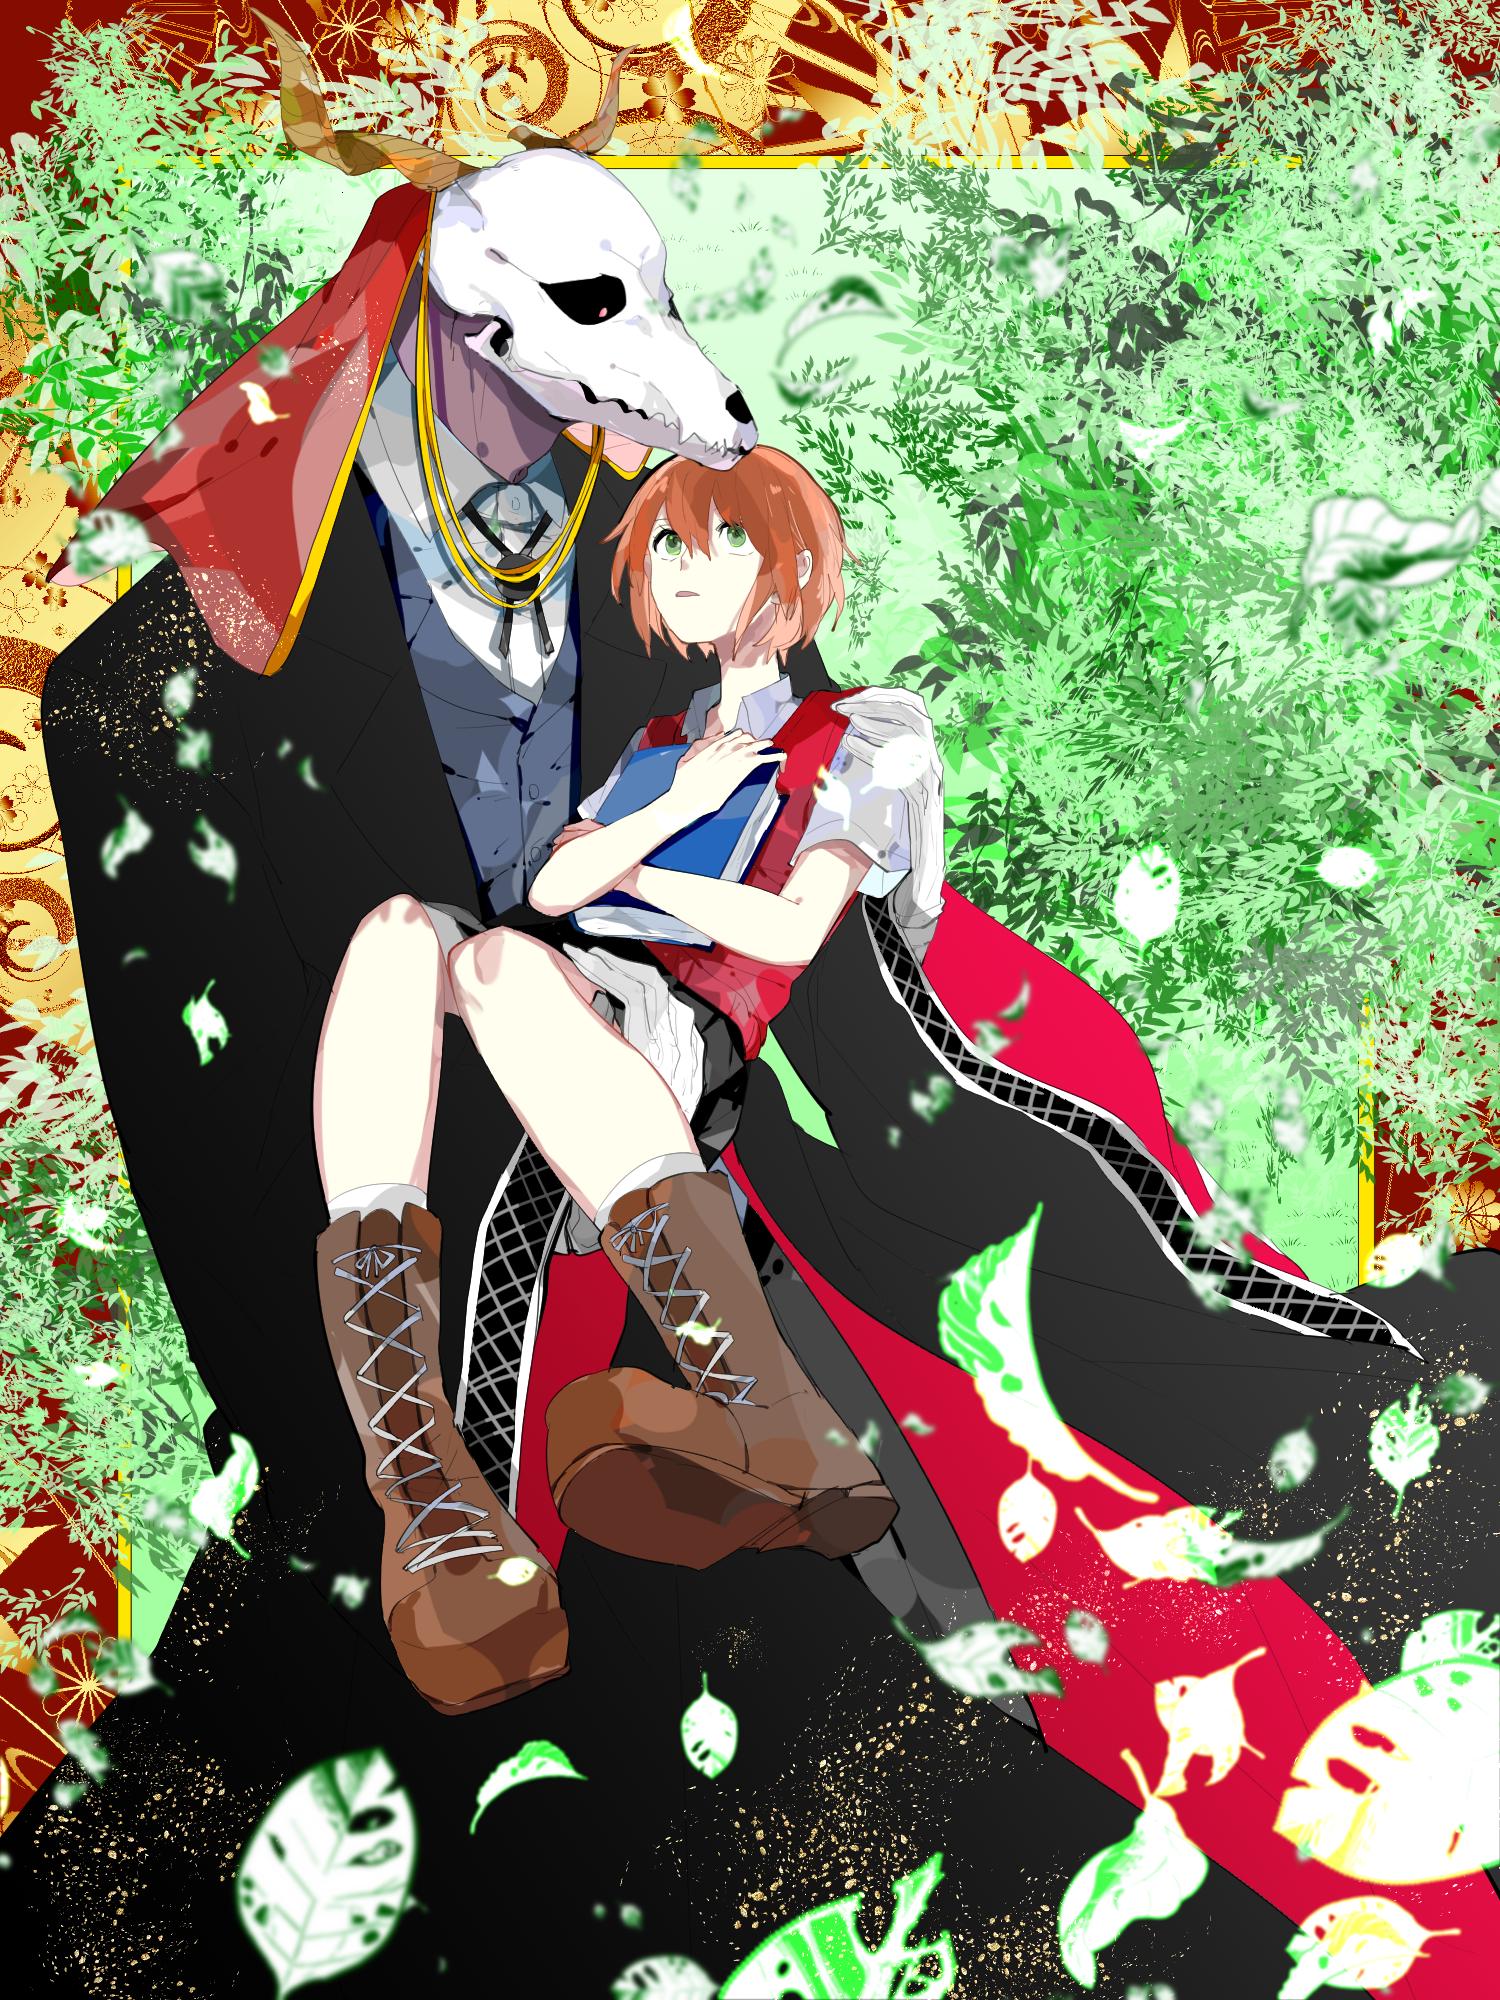 Wallpaper Mahoutsukai No Yome Hatori Chise Elias Ainsworth